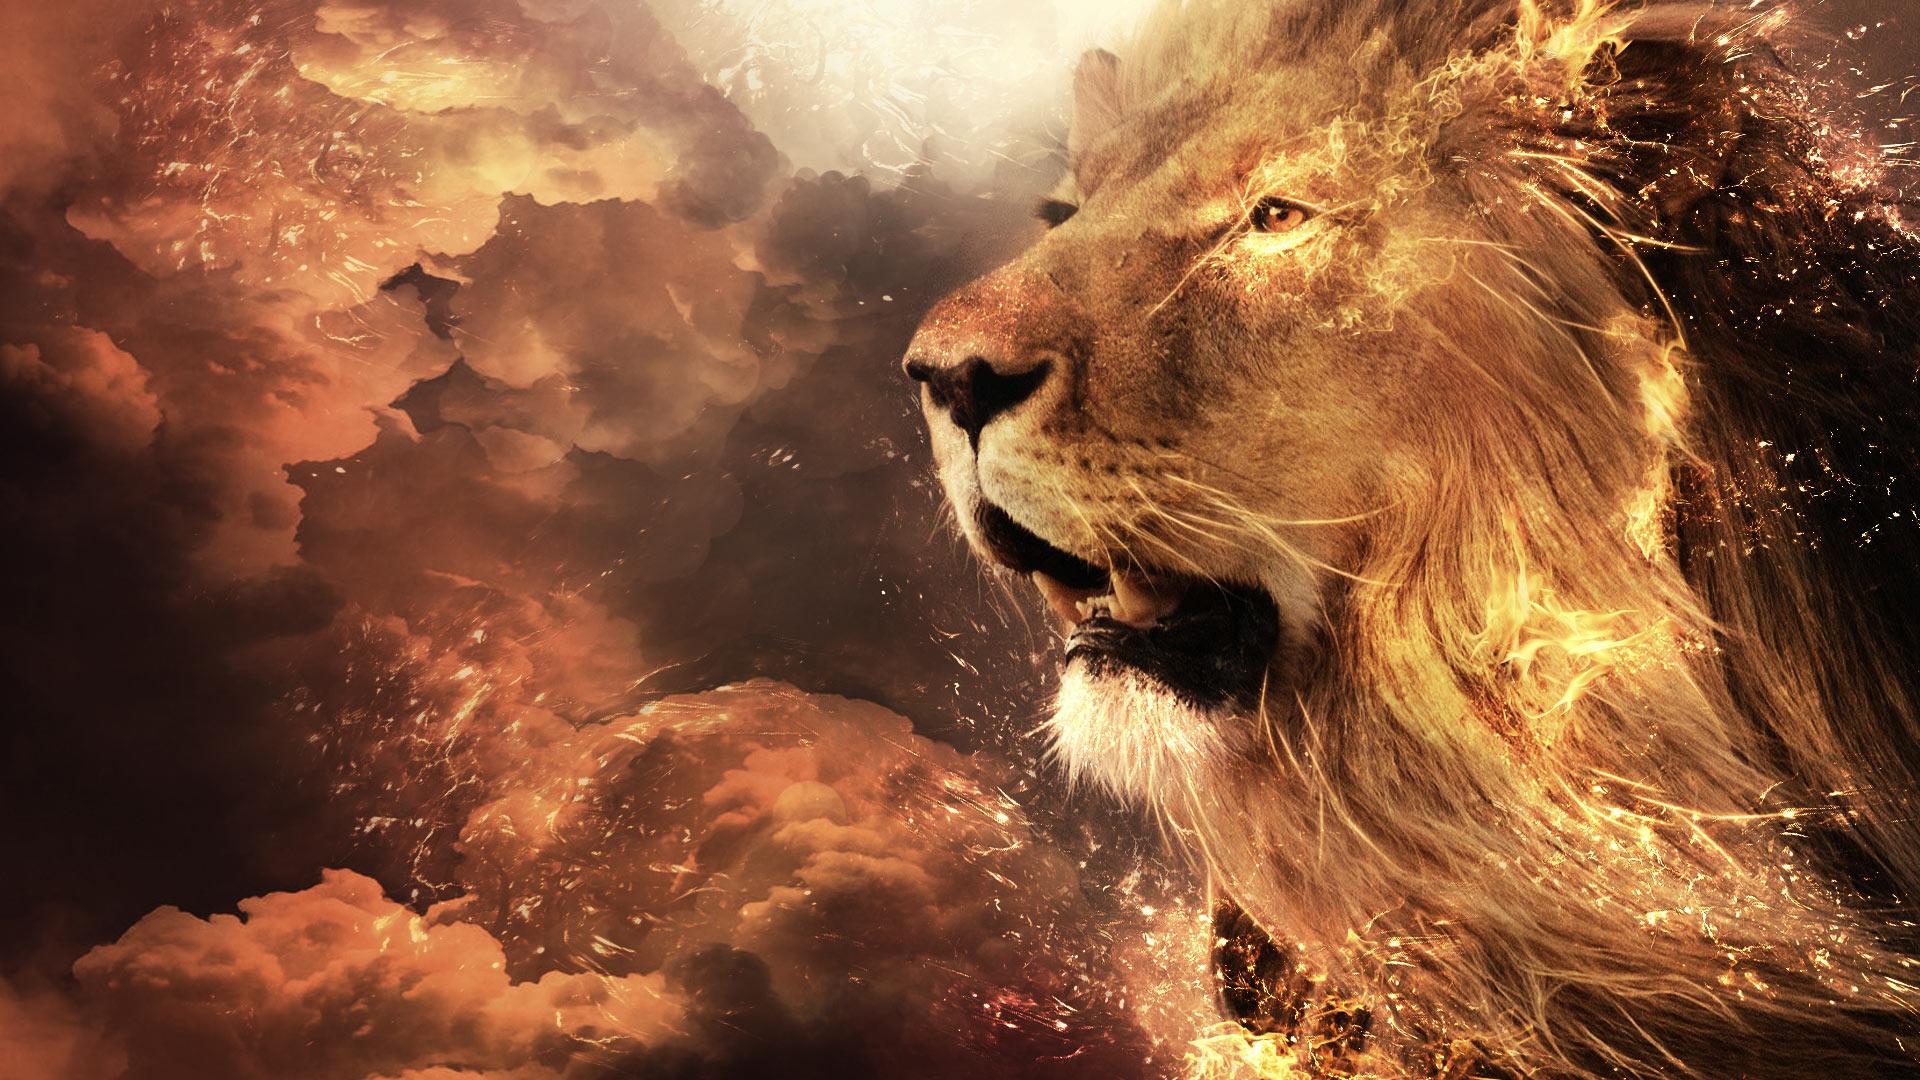 Lion Full Hd Wallpaper And Hintergrund 1920x1080 Id 498189